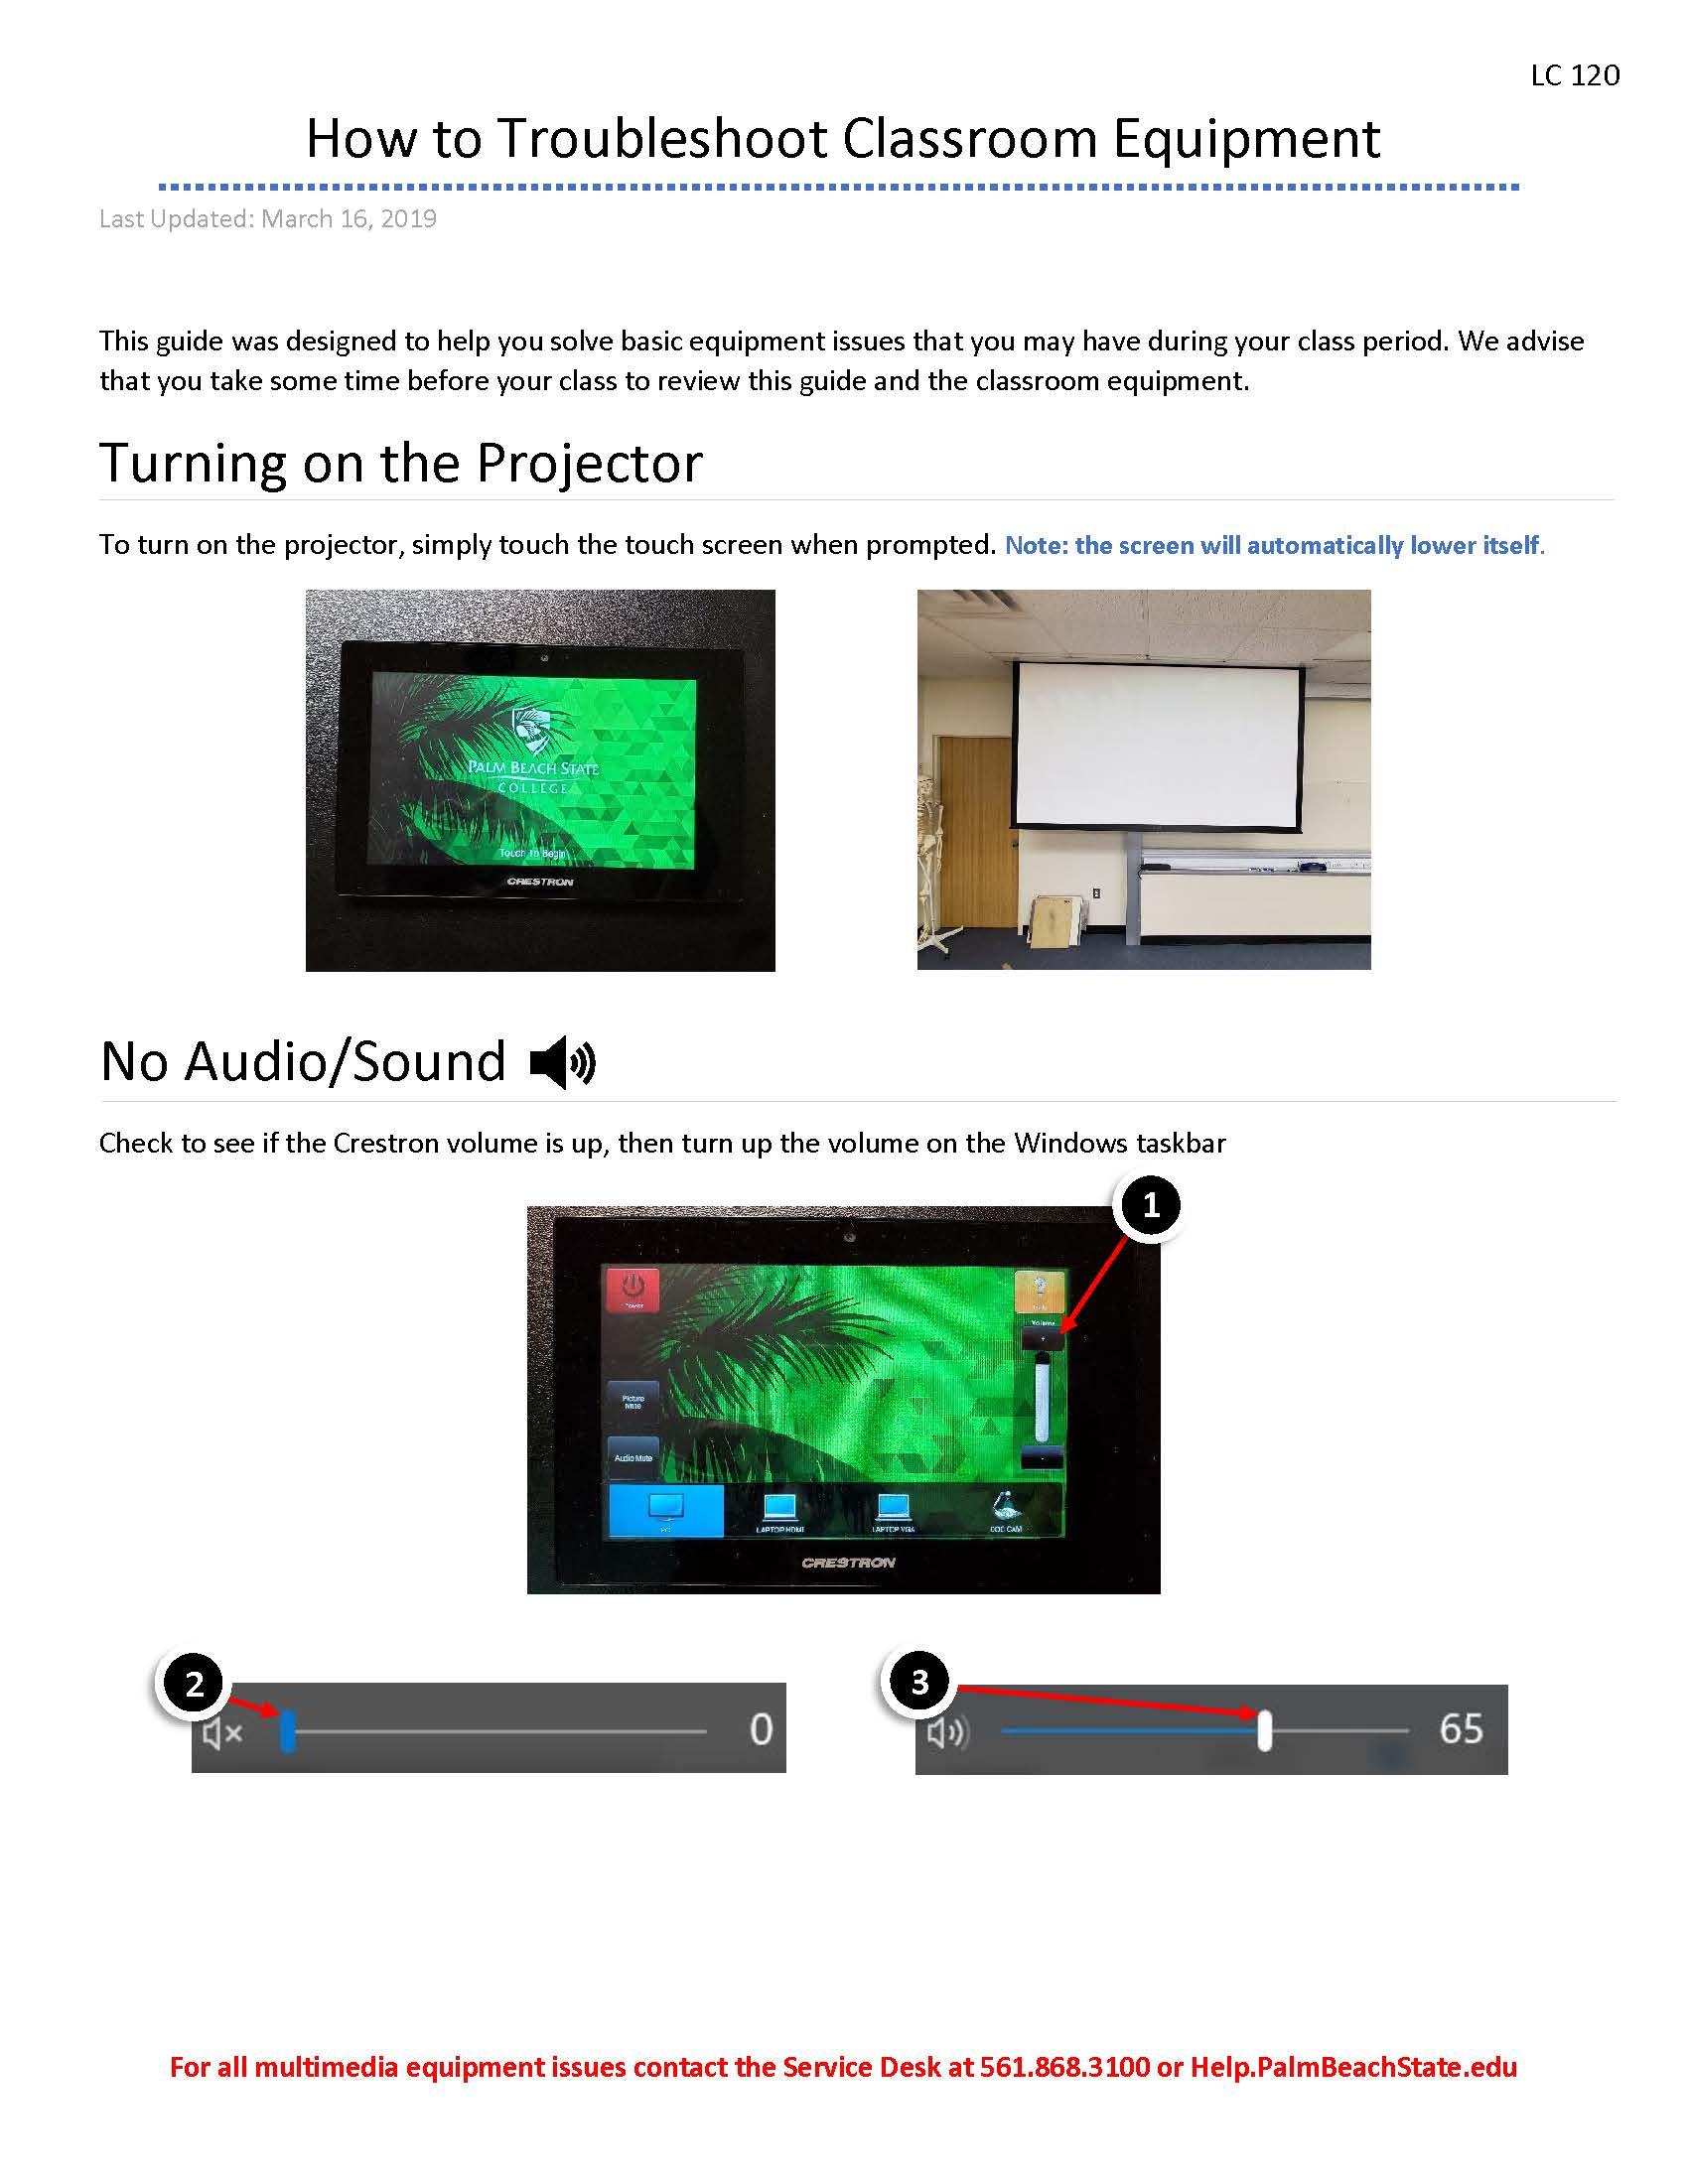 LC120 Multimedia Guide